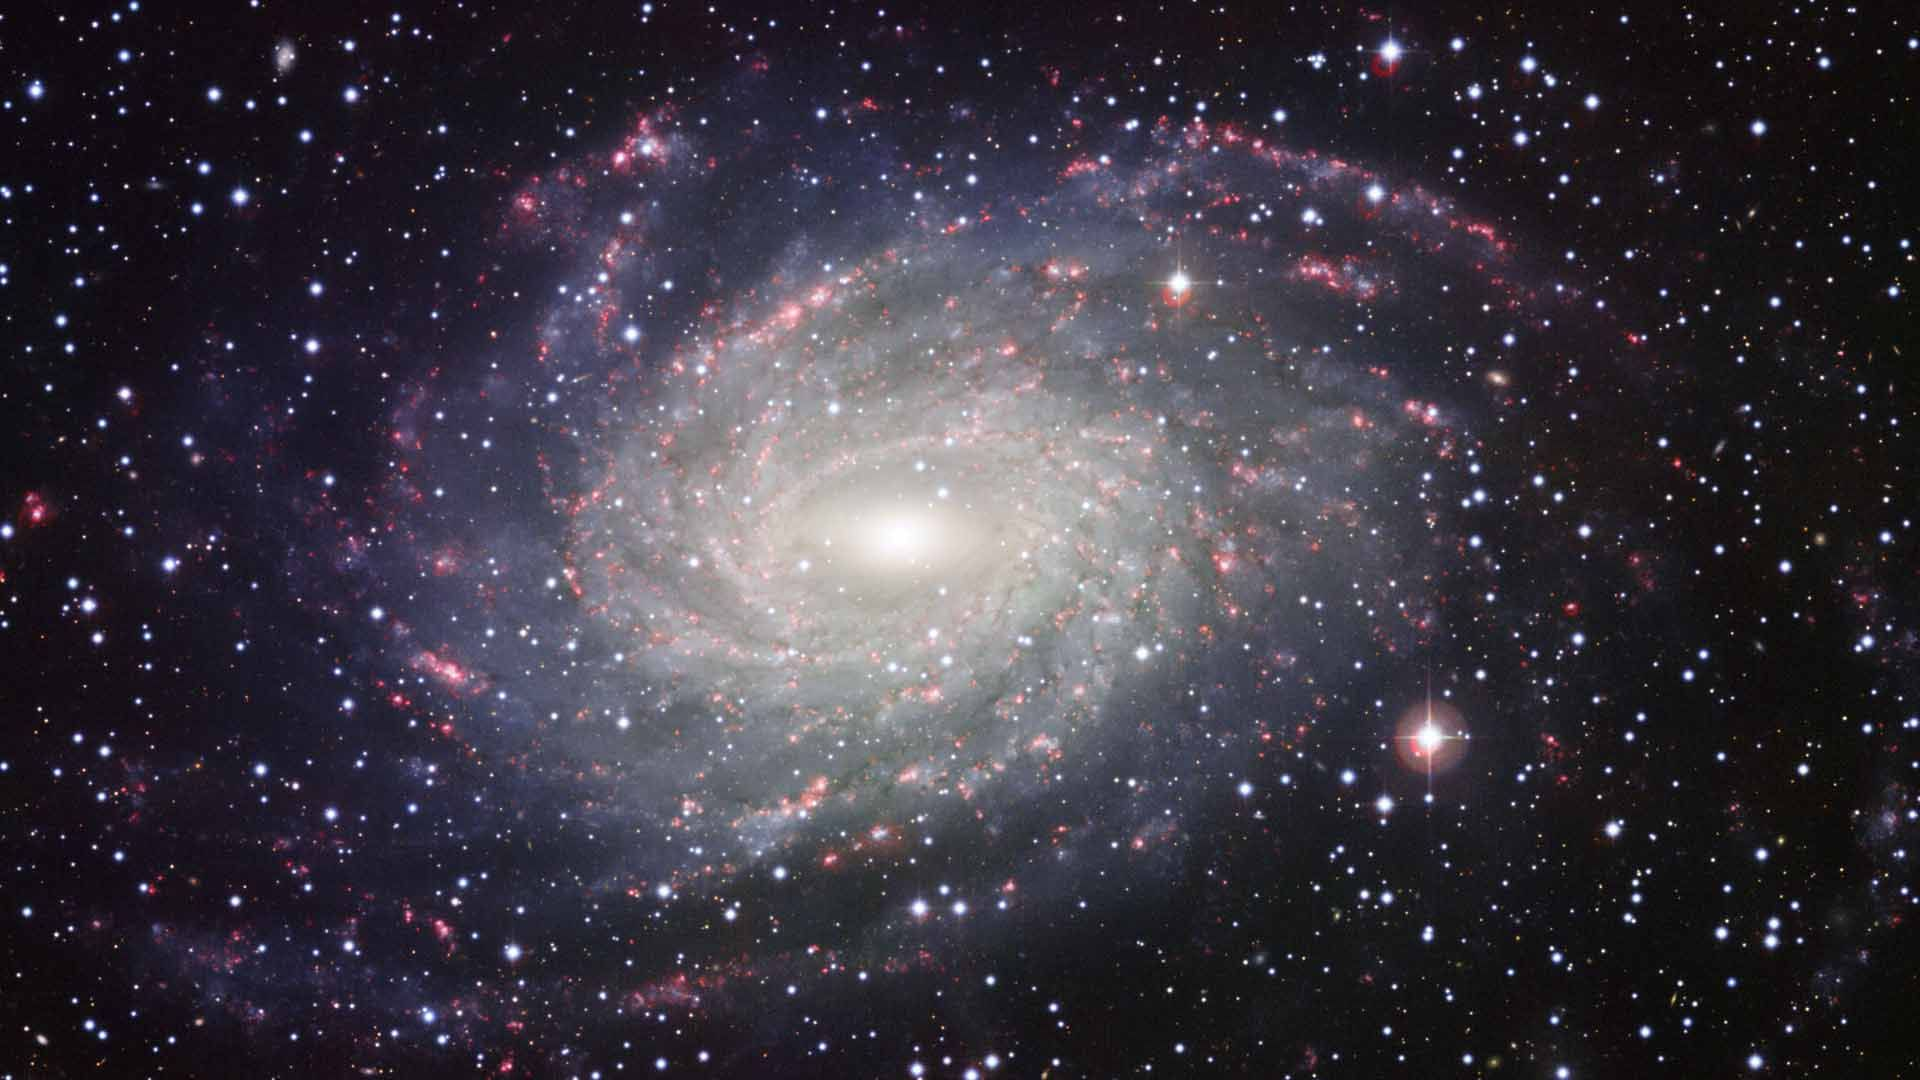 Spiral Galaxy Hd Latest Laptop Wallpaper Spiral Galaxy Milky Way Galaxy Milky Way